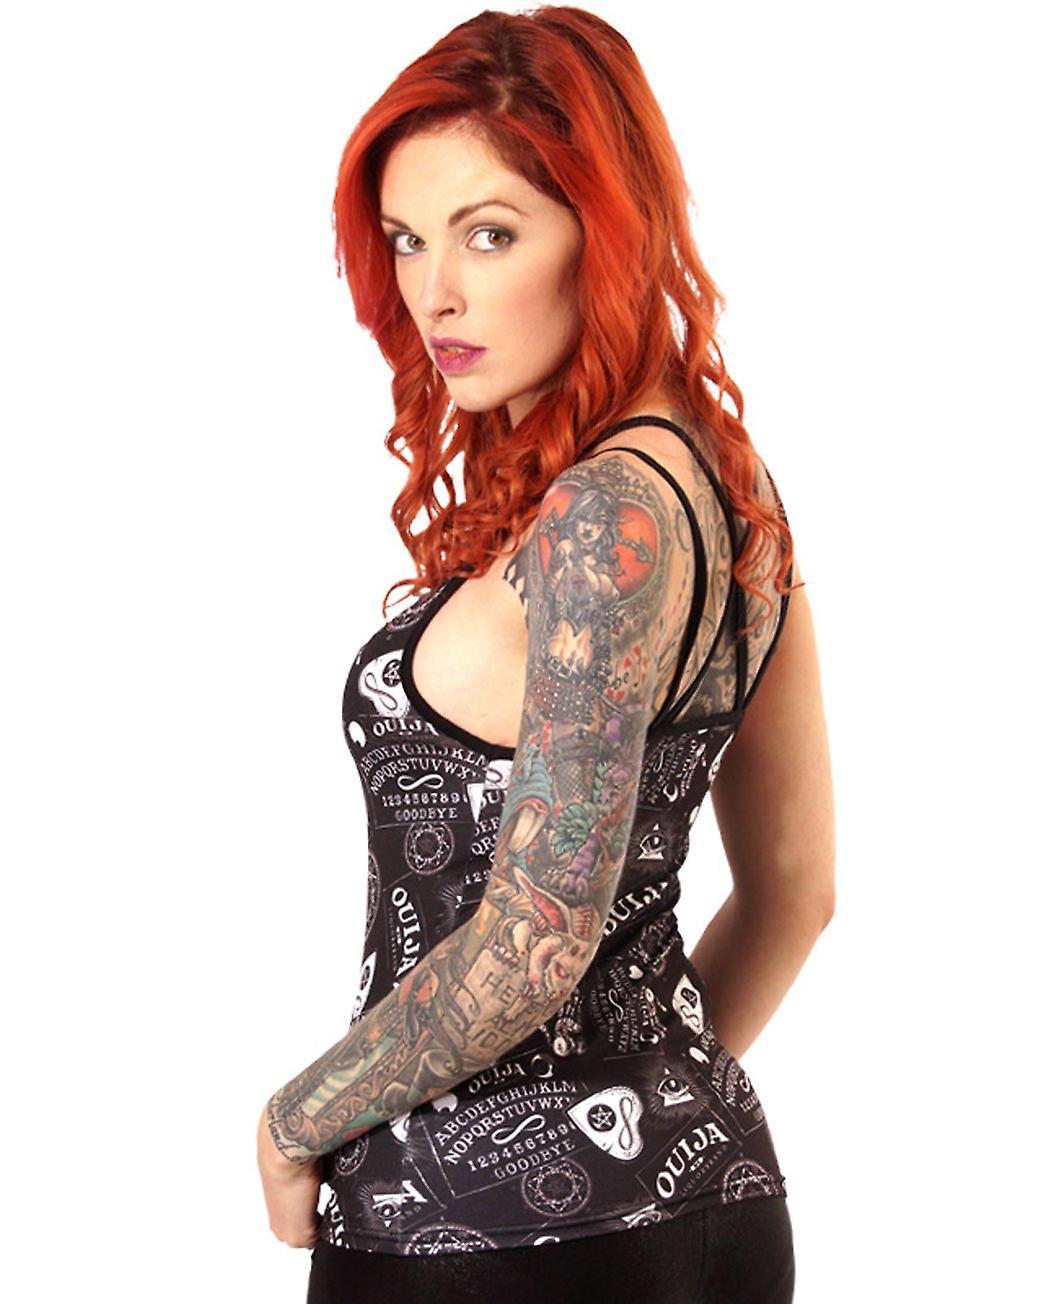 Liquor Brand - OUIJA PATTERN - Women's Shoulder Strap Vest Top, Black